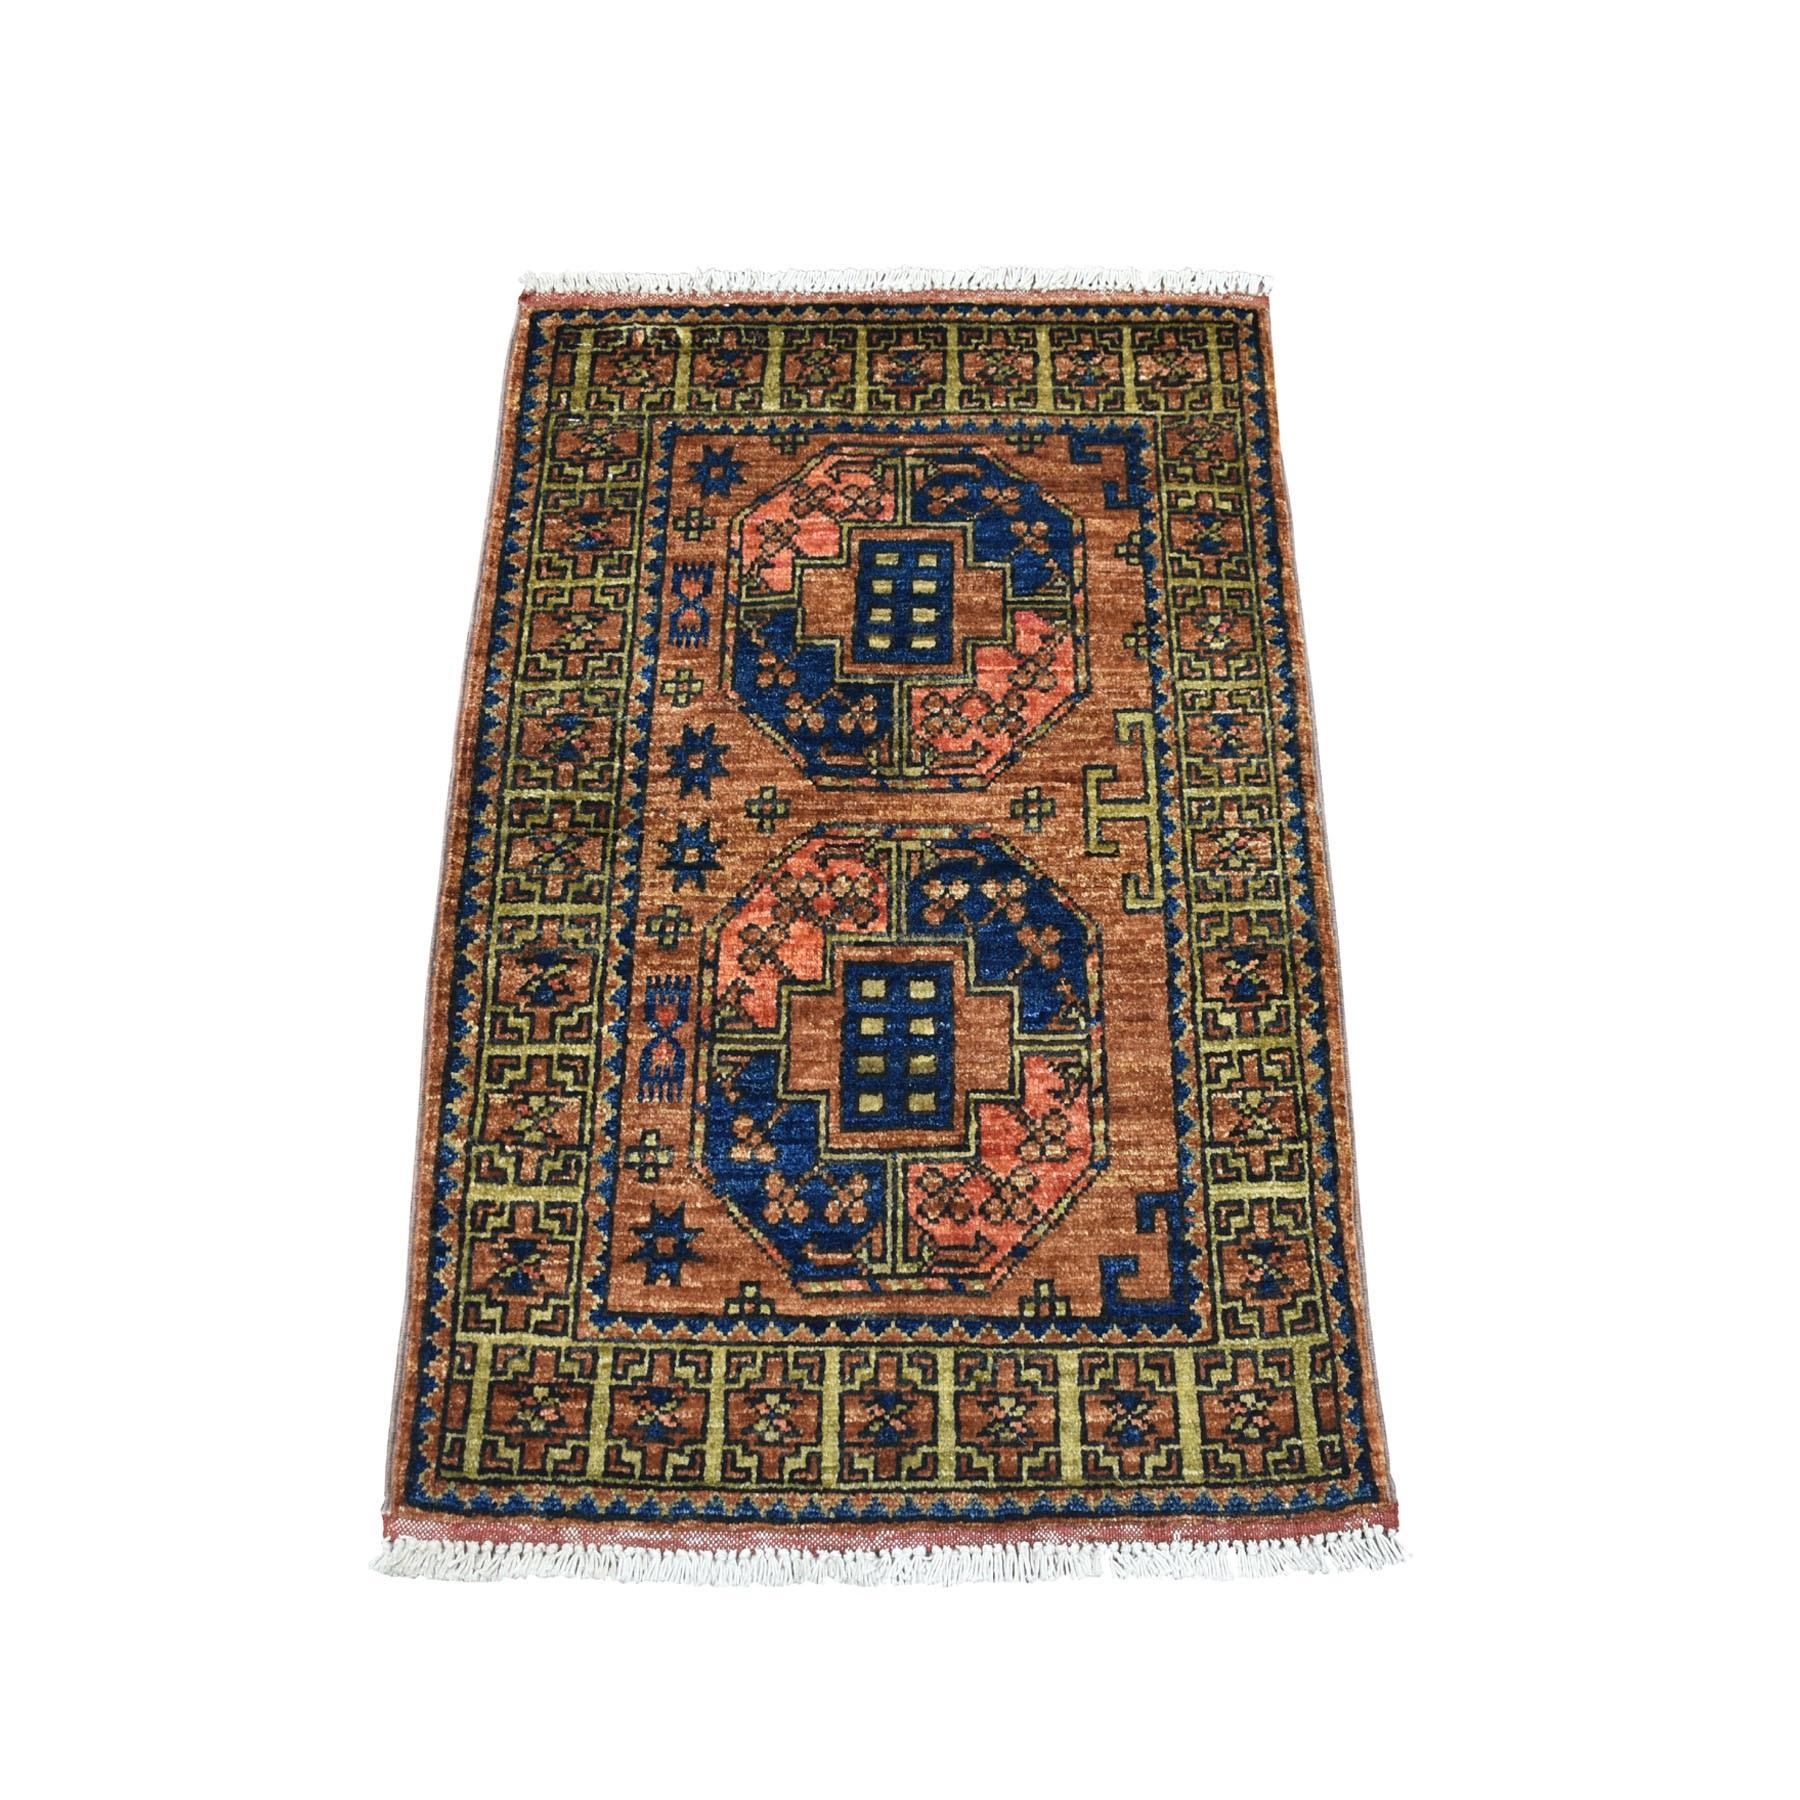 "2'x2'10"" Brown Afghan Ersari Elephant Feet Hand Knotted Pure Wool Oriental Rug 53424"